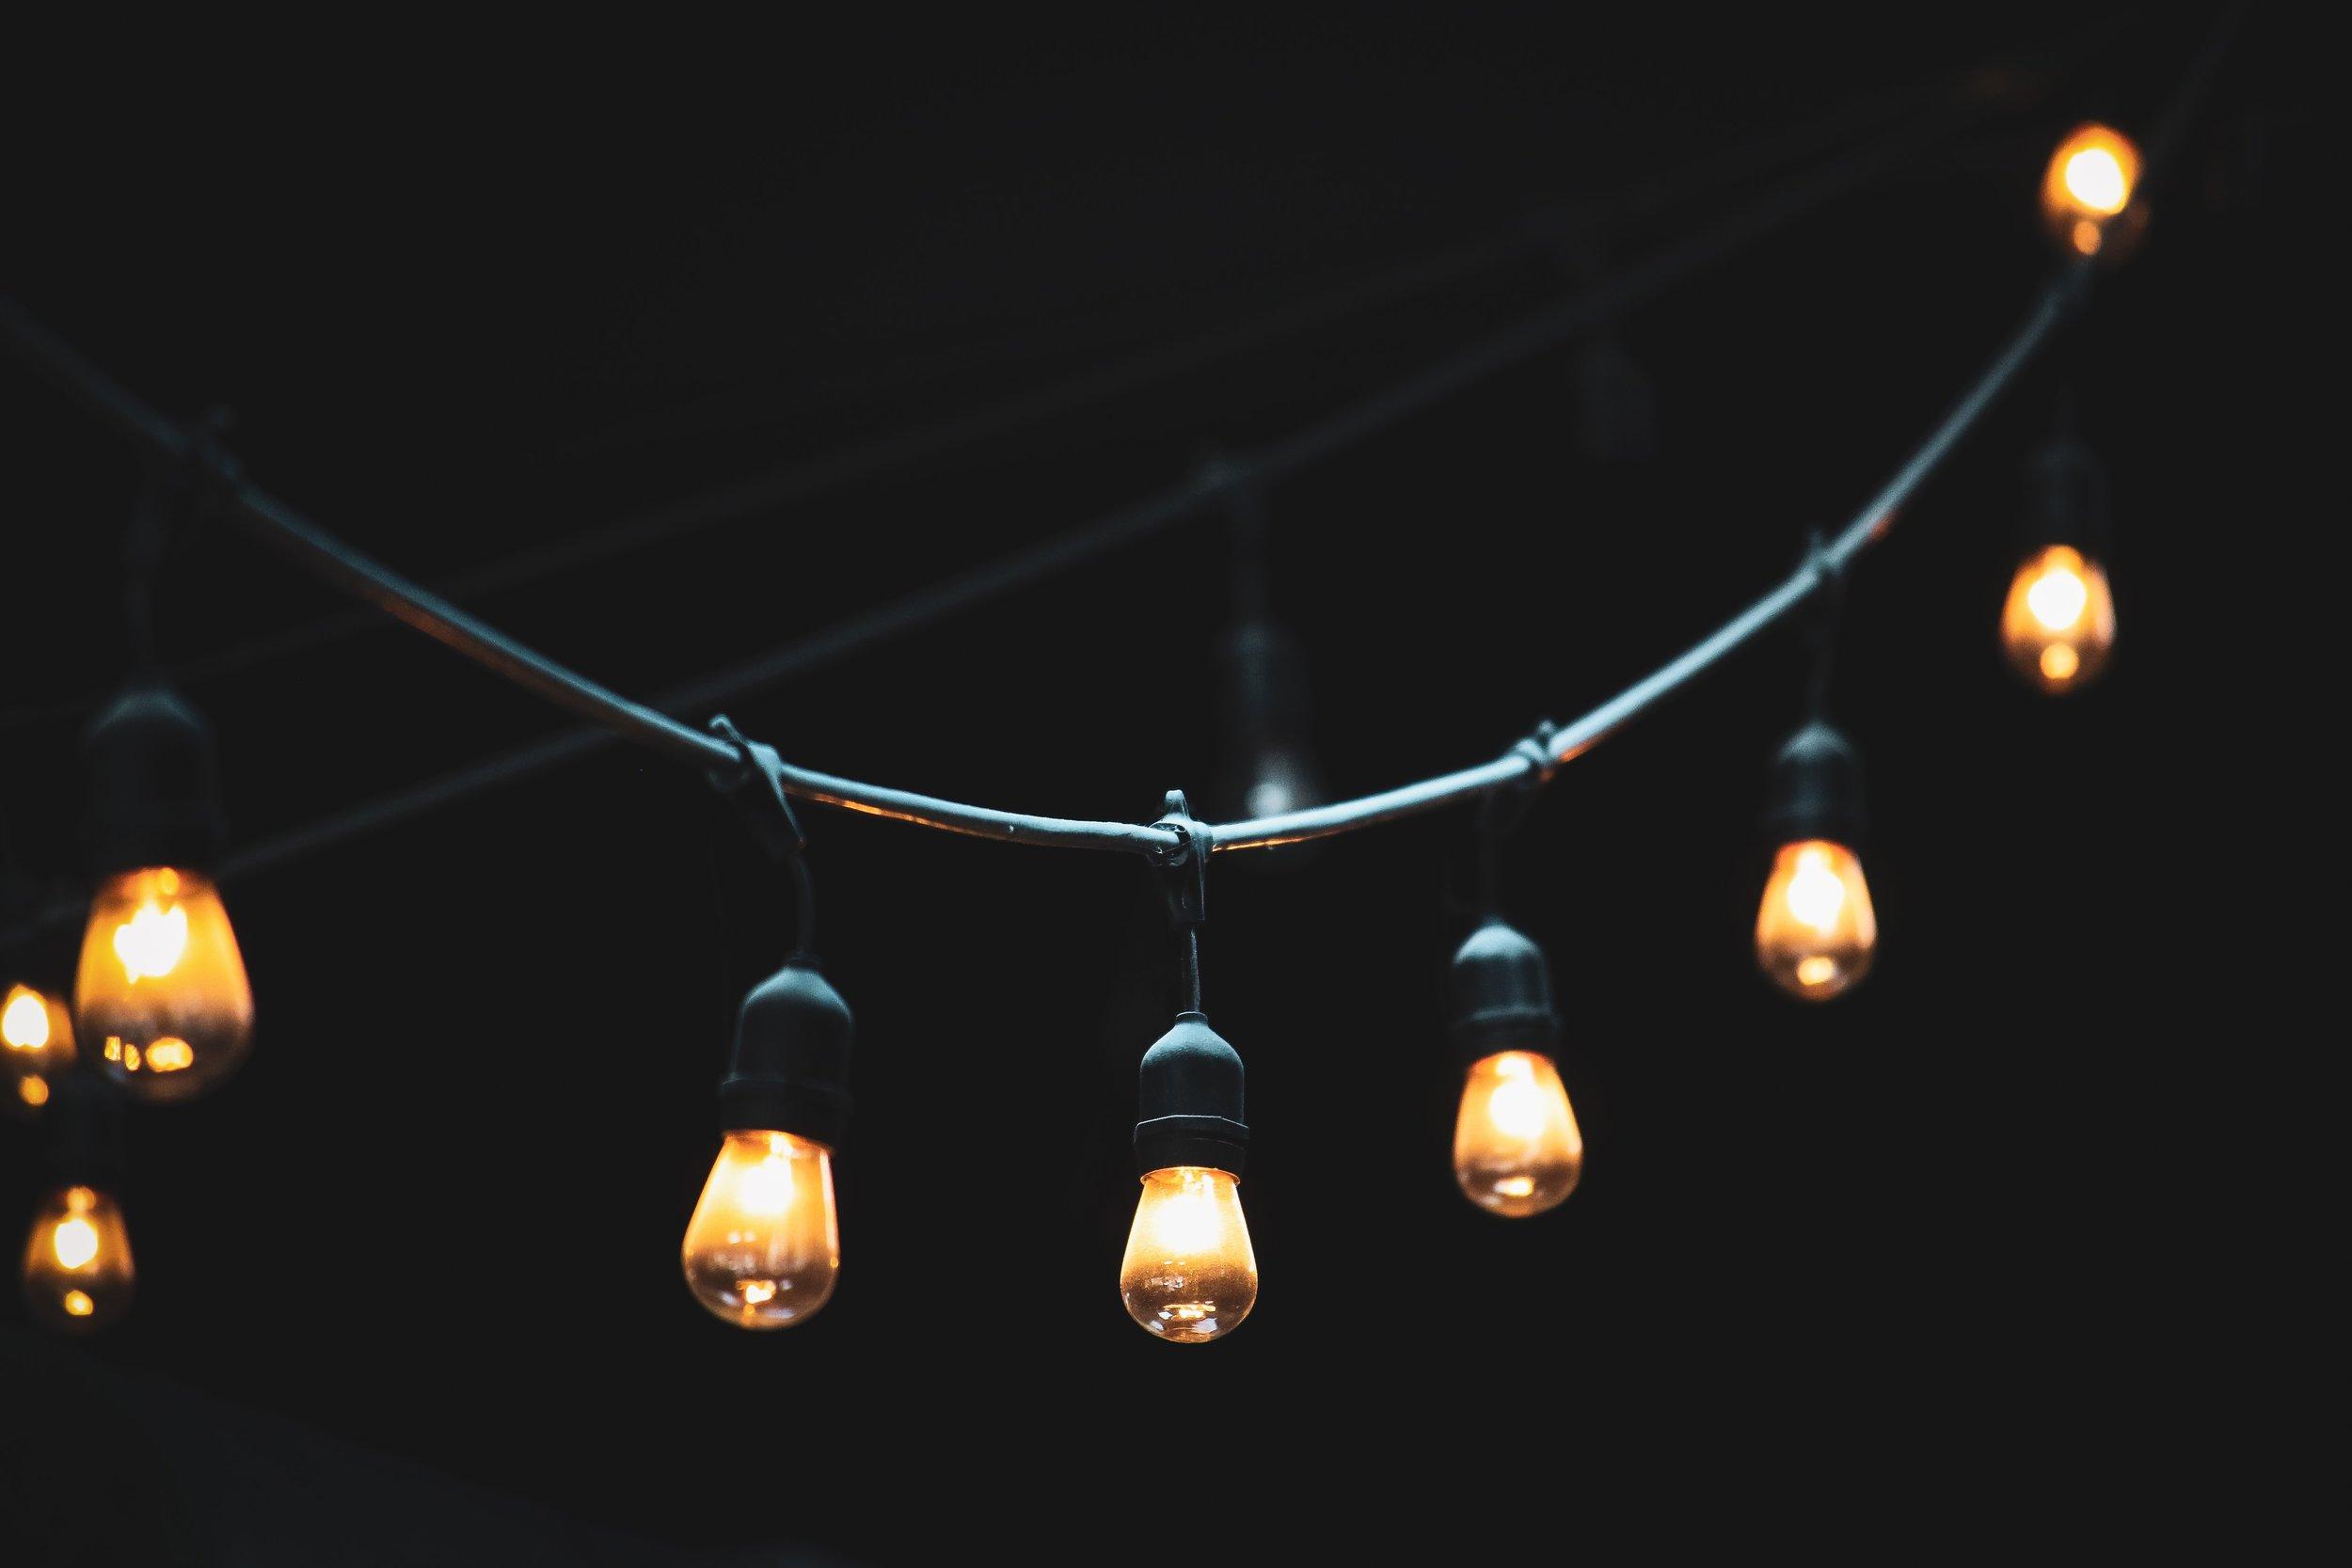 art-bright-bulbs-1146562.jpg